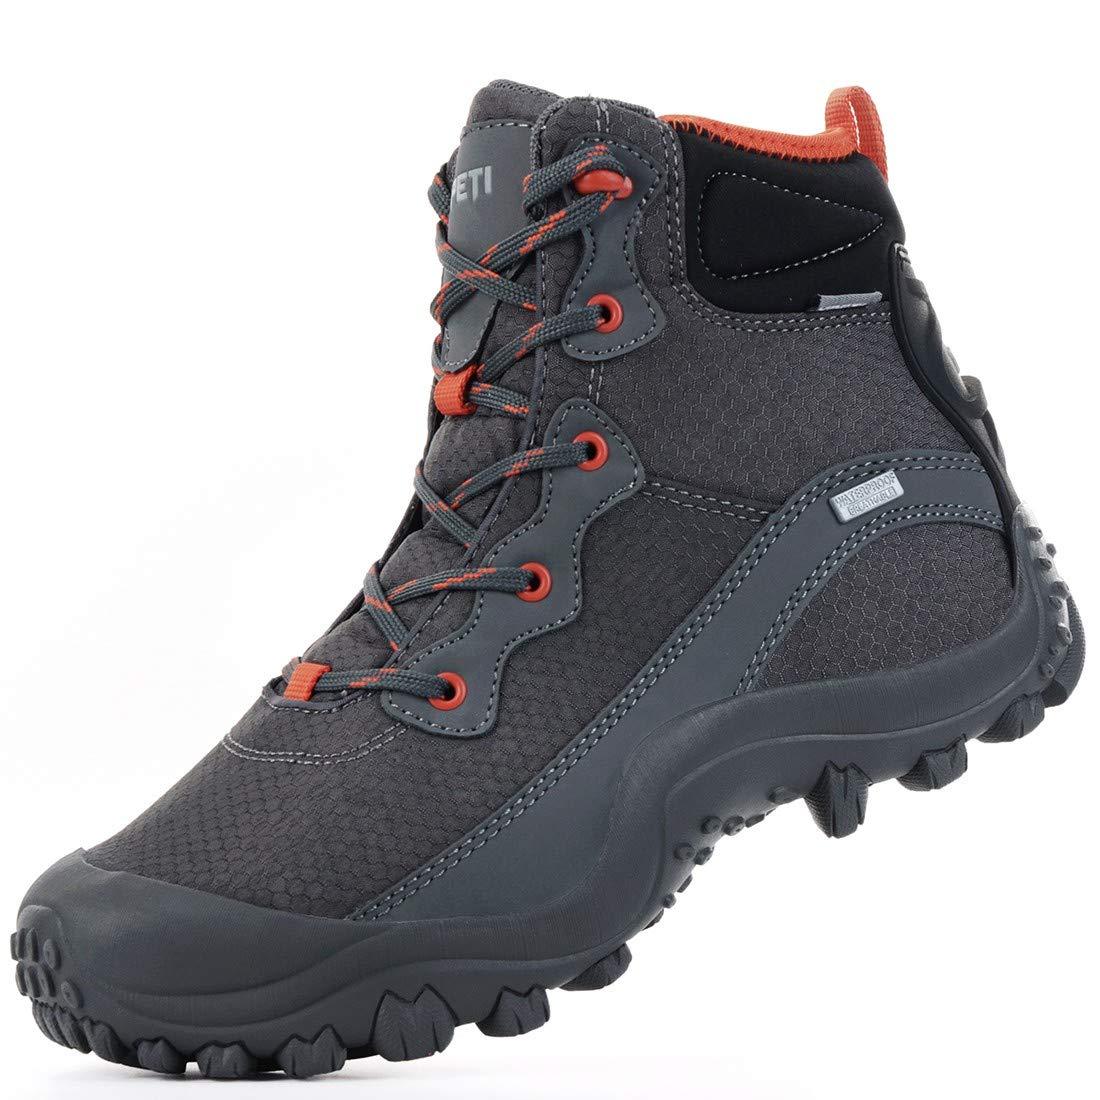 abf6ec37e7a XPETI Dimo Men's Waterproof Hiking Boots